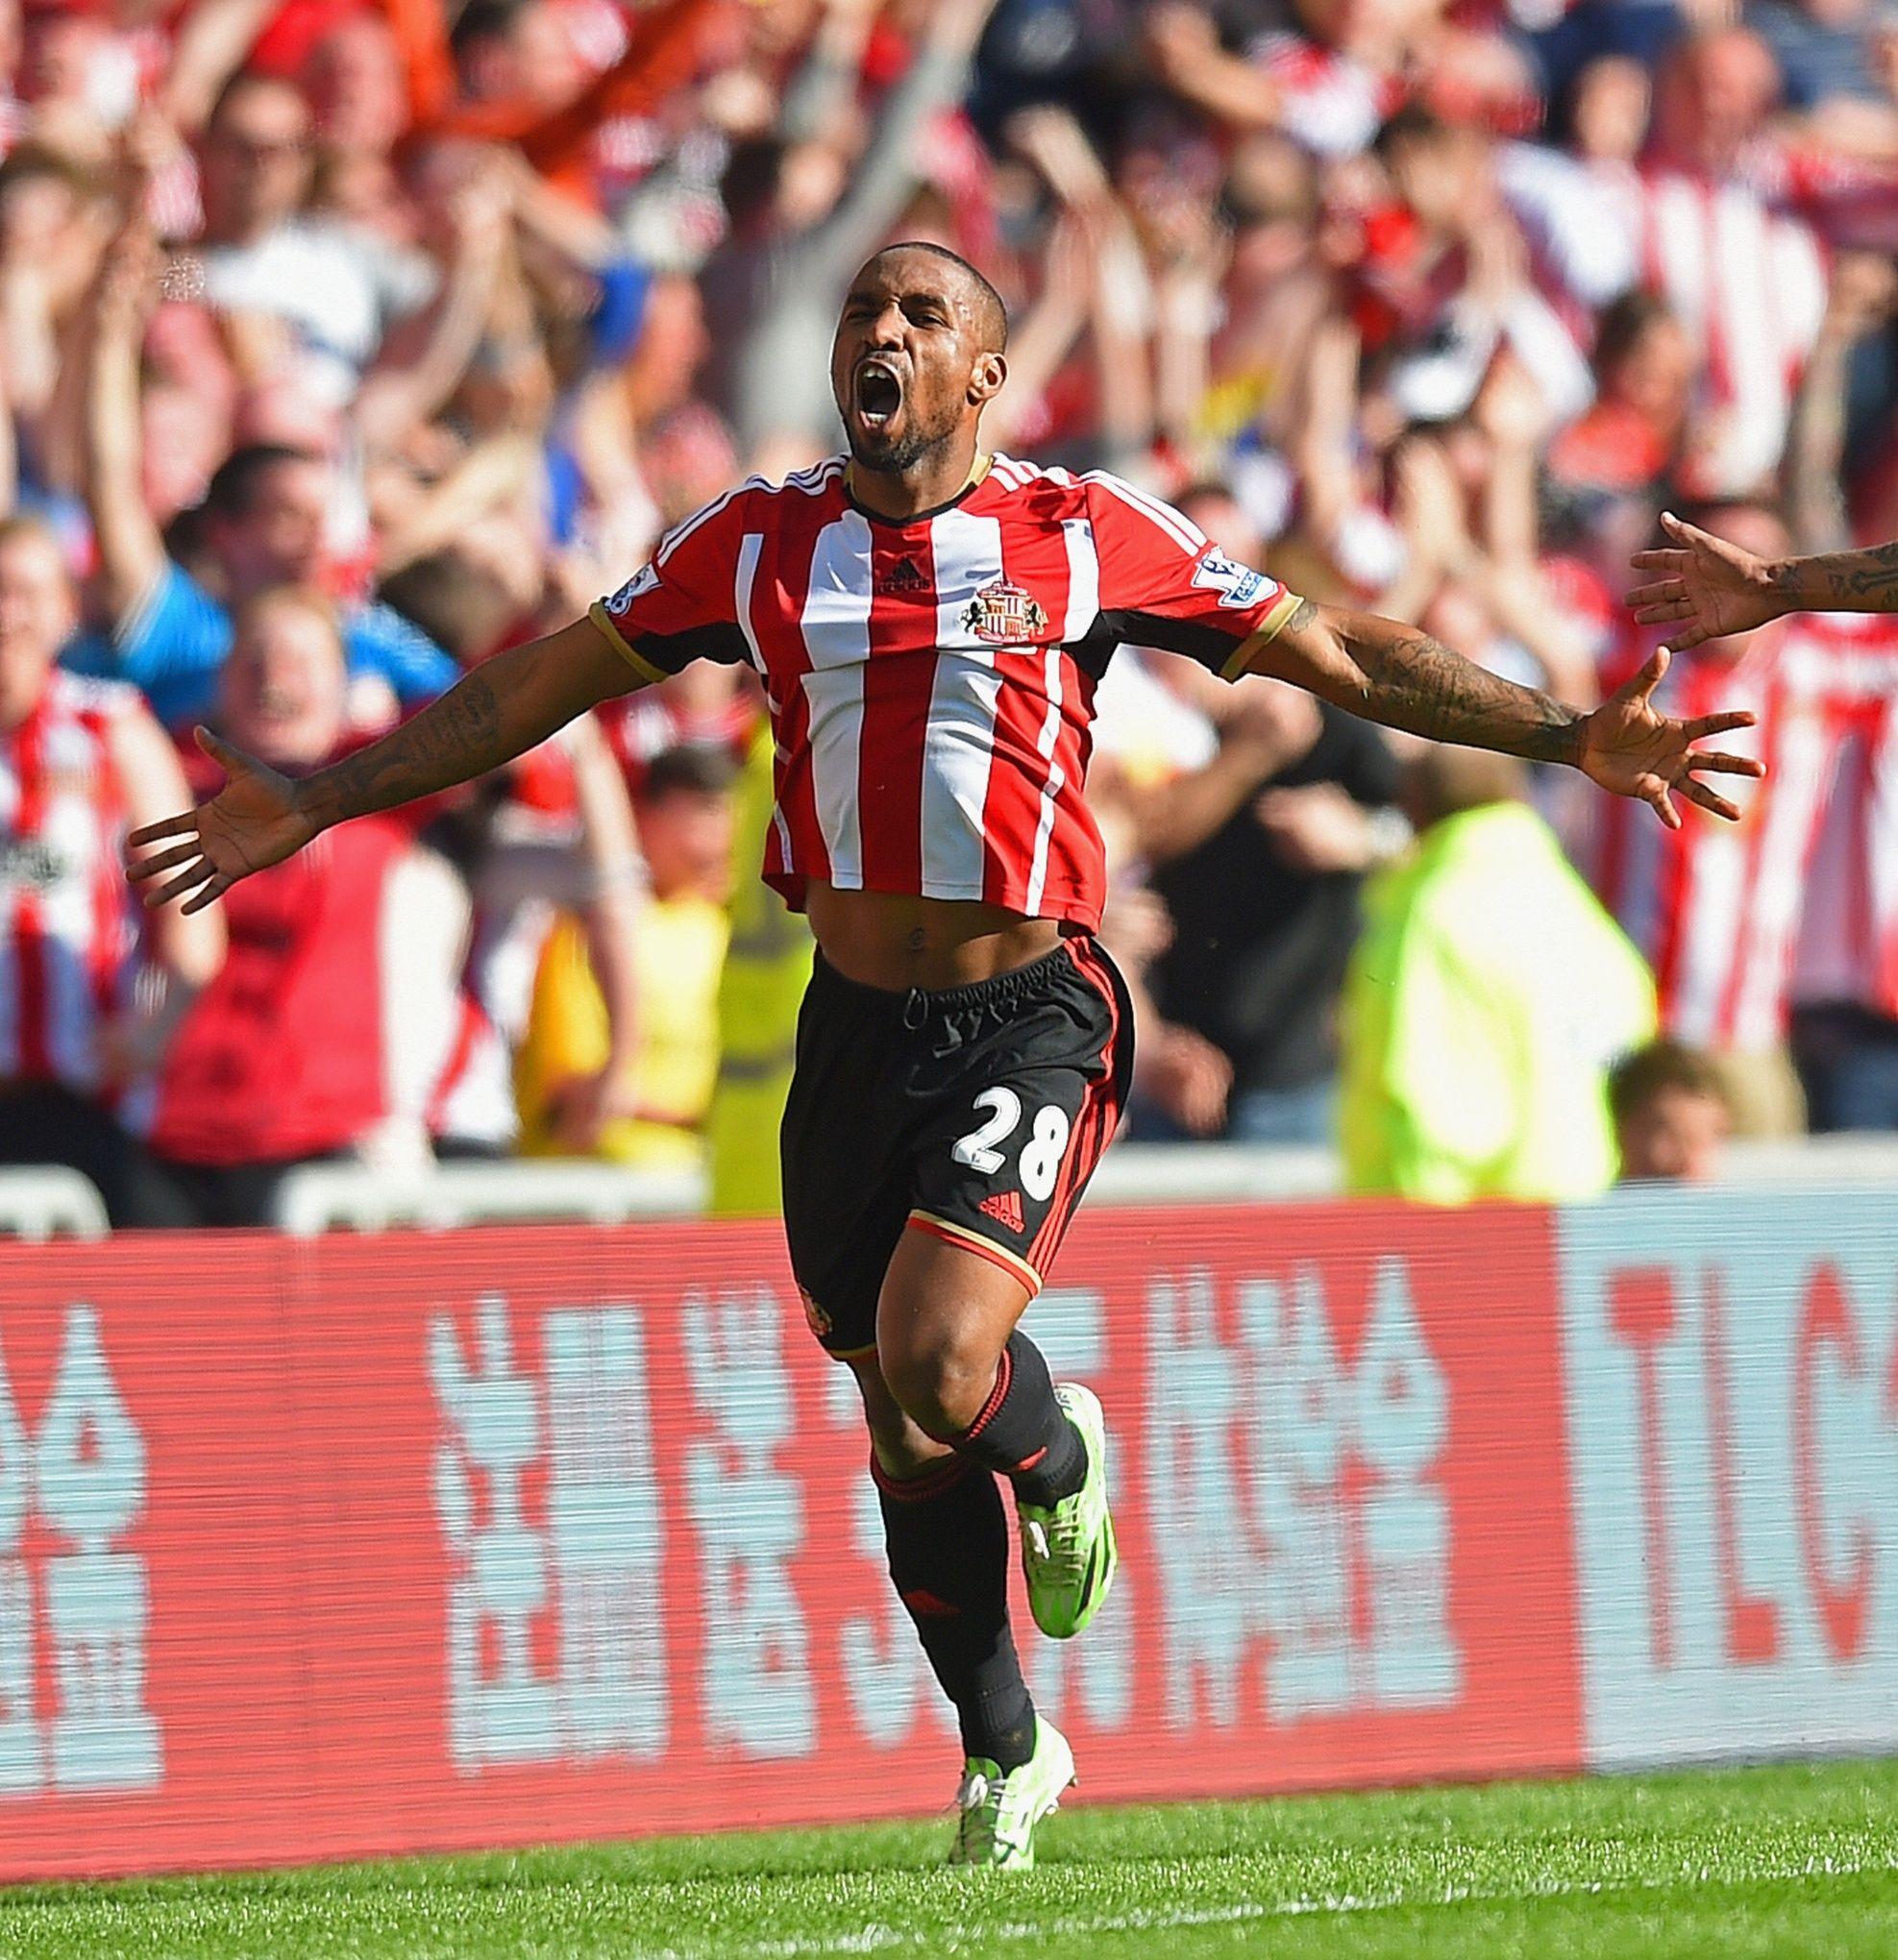 Jermaine Defoe Of Sunderland Afc Against Newcastle United Sunderland Football Sunderland Sunderland Afc